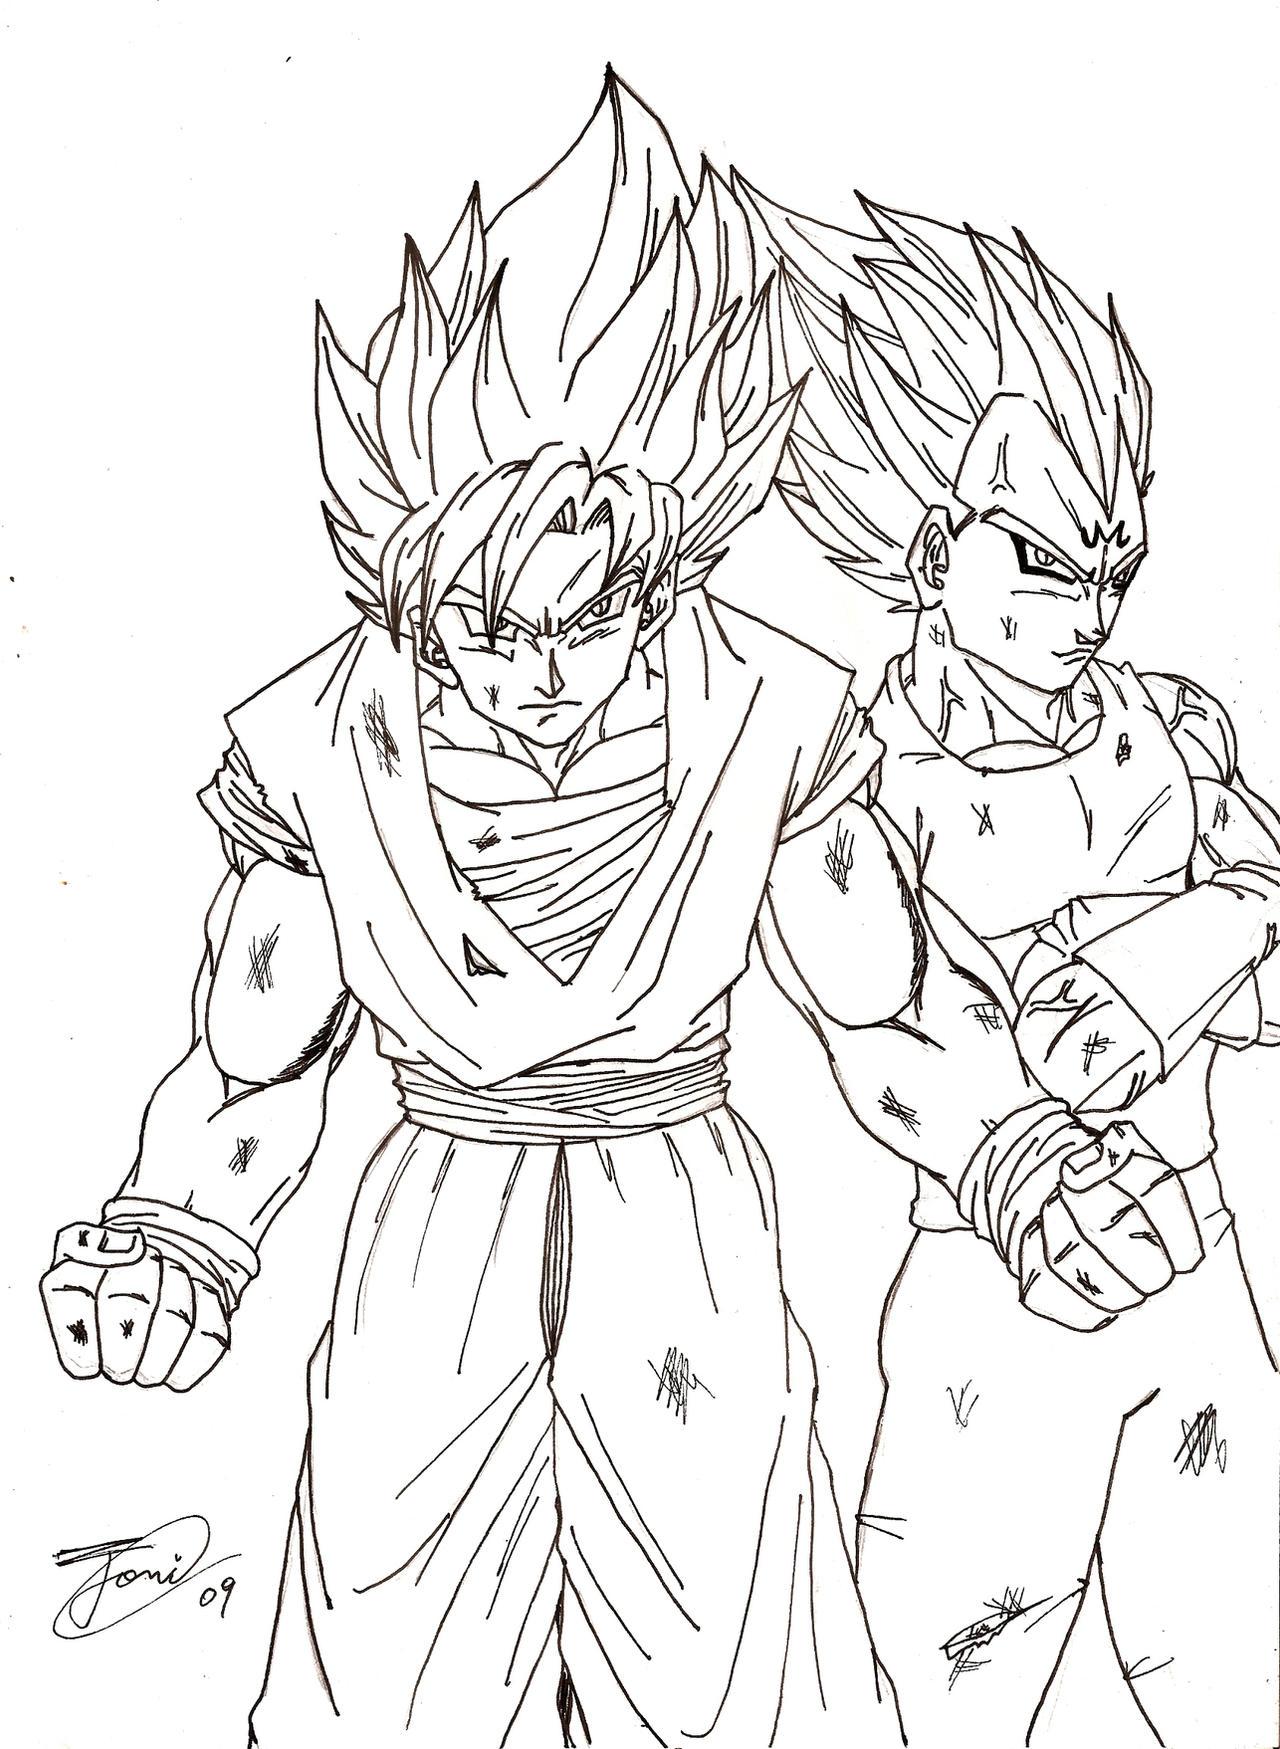 Coloring Page Vs Dragon Ball Z